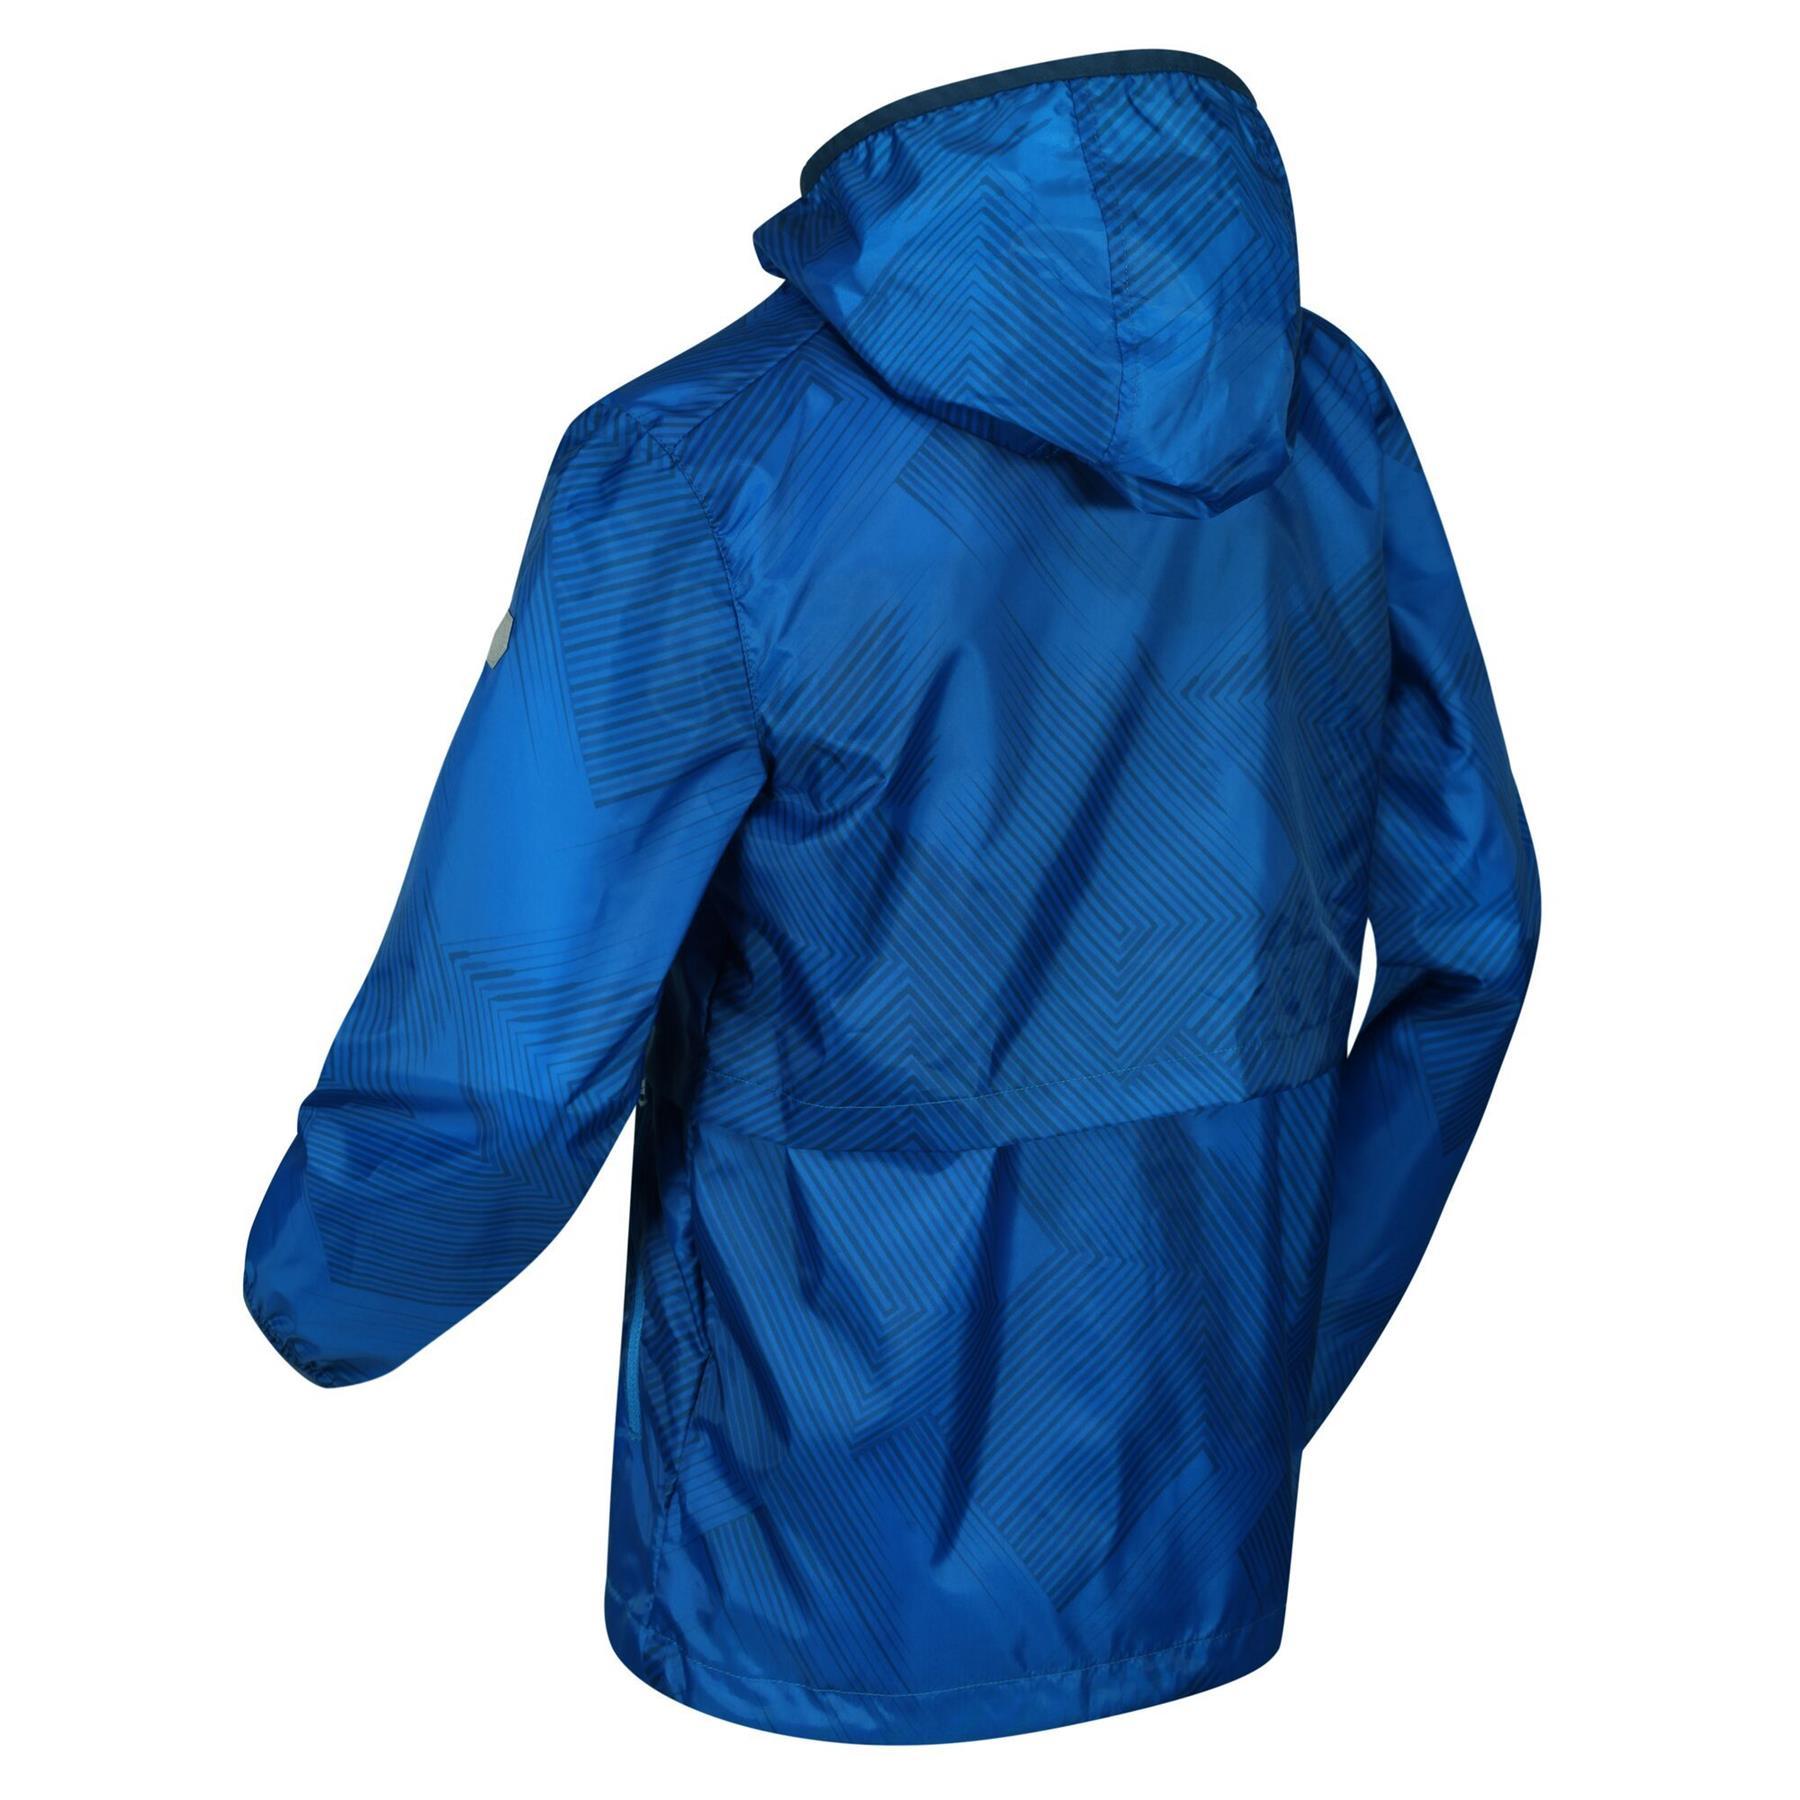 miniatuur 7 - Regatta Kids Bagley Waterproof Hooded Packable Jacket Boys Girls Rain Coat